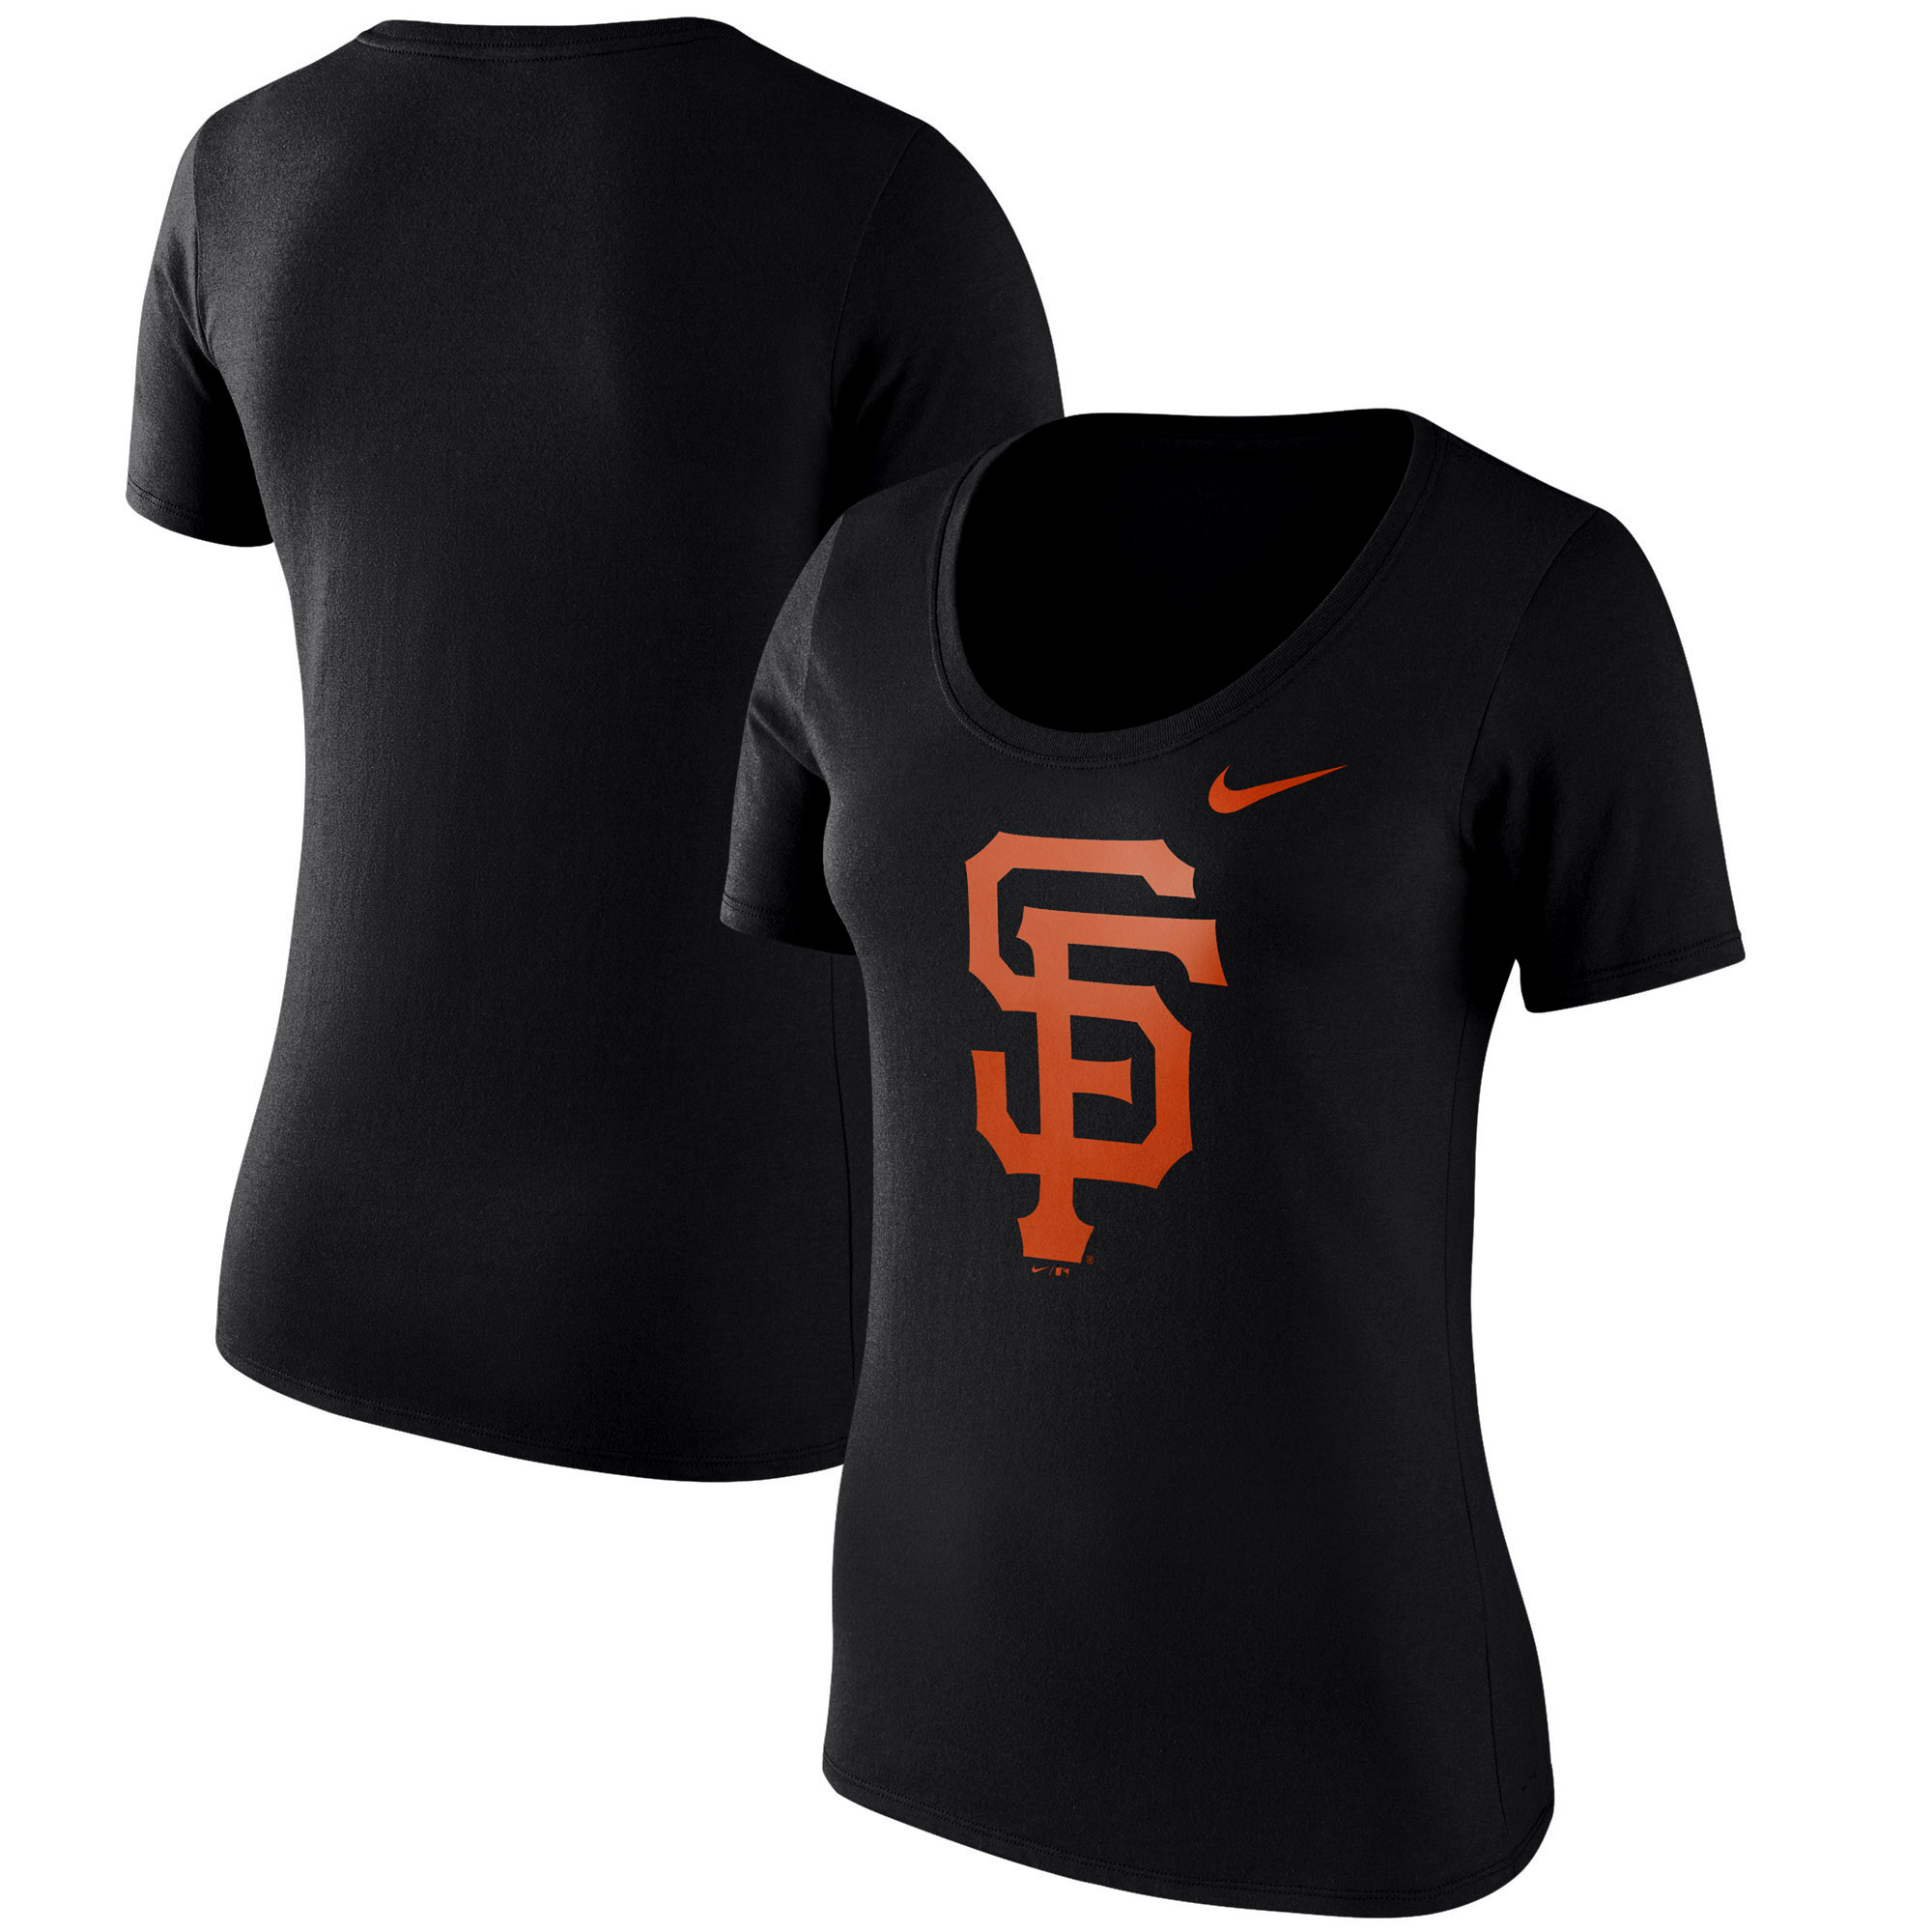 San Francisco Giants Nike Women's Logo Scoop Neck T-Shirt - Black